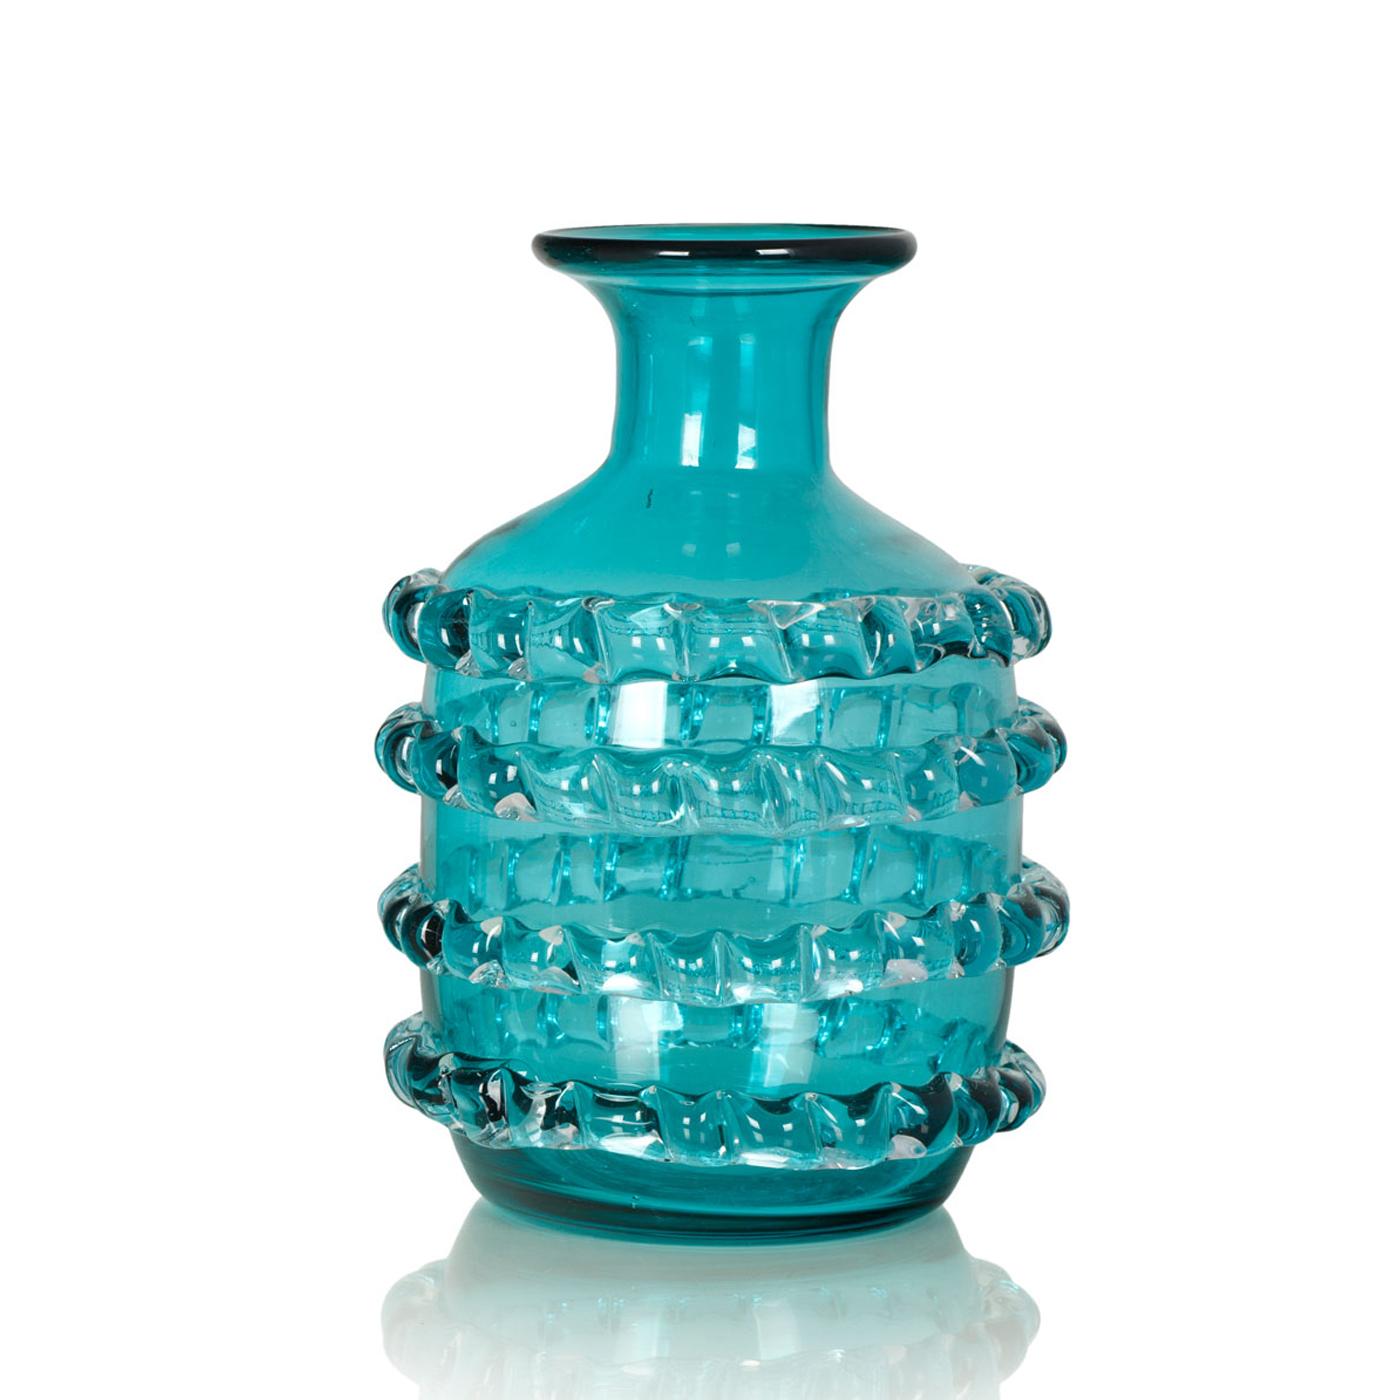 {} Home Philosophy Ваза Lambie Цвет: Бирюзовый (18х26 см) ваза кружева цветов 26 см